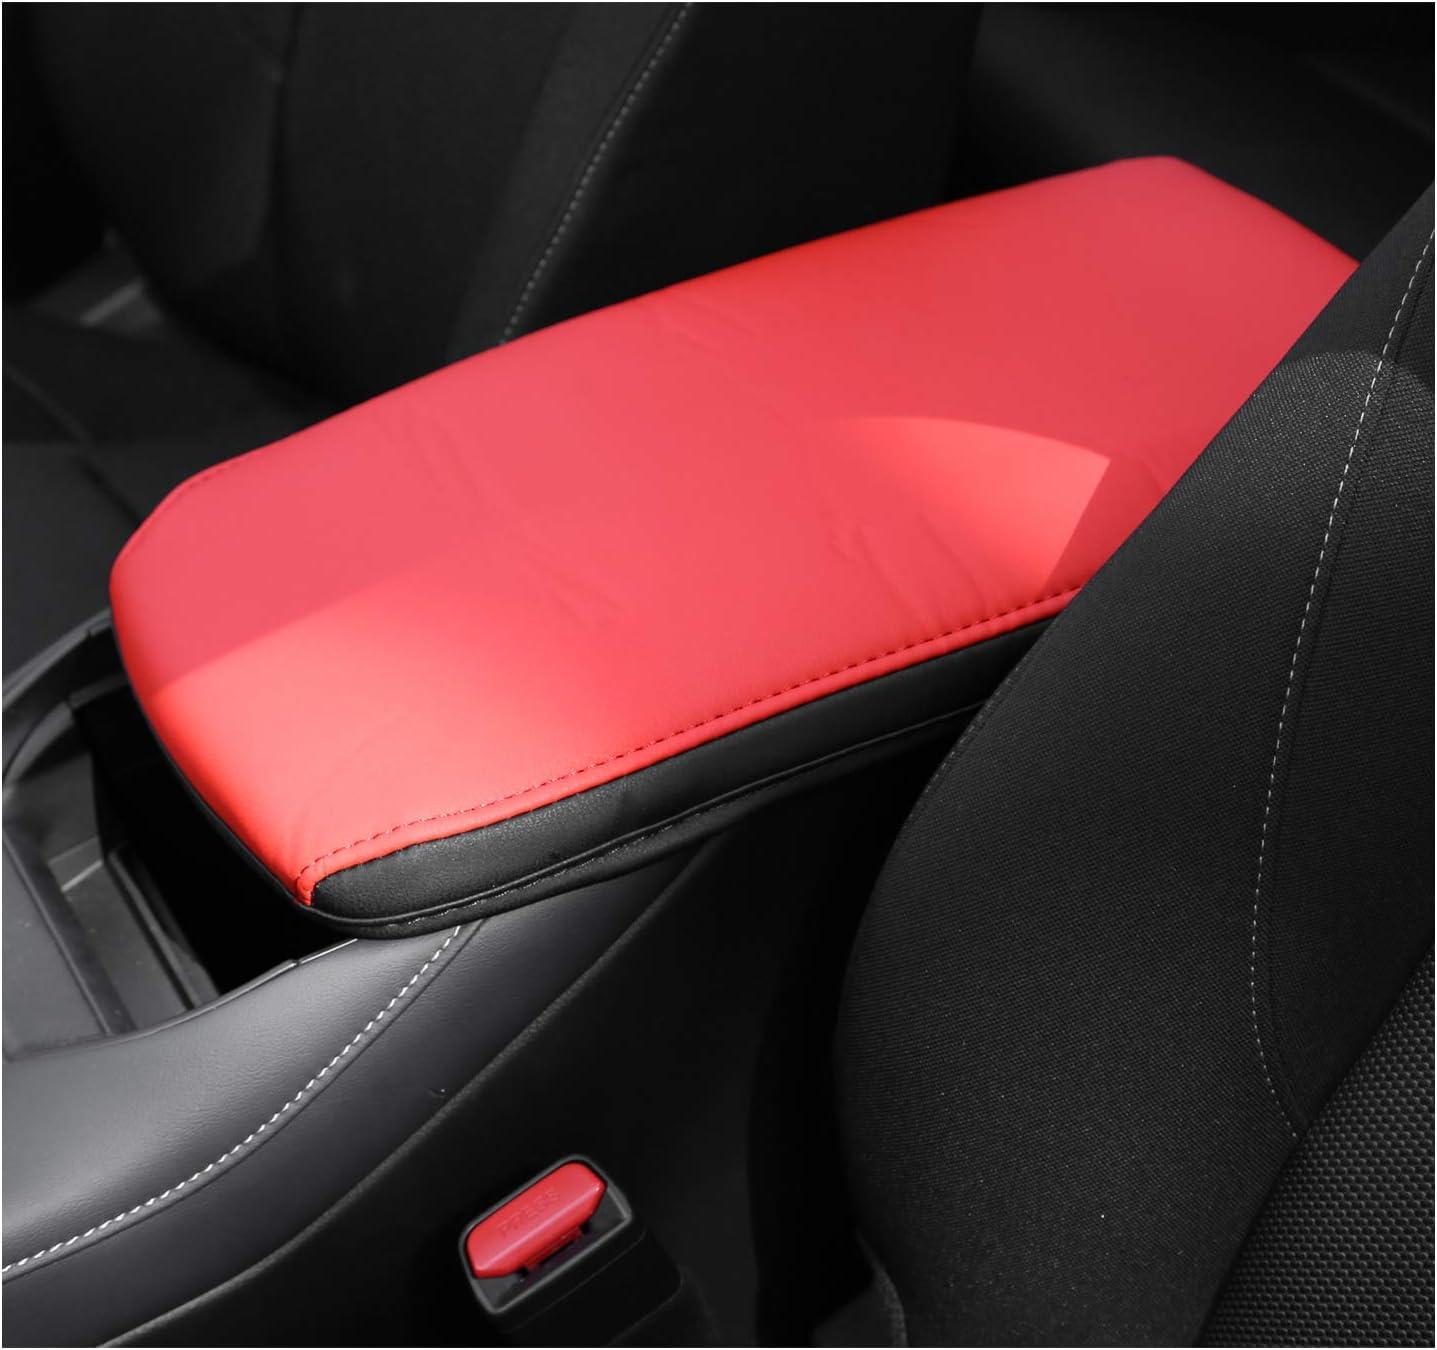 SHAOHAO Mittelarmlehne Abdeckung f/ür Mazda CX-30 DM 2019 Mittelarmlehnenabdeckung Zubeh/ör Mittelkonsole Armlehnenbezug